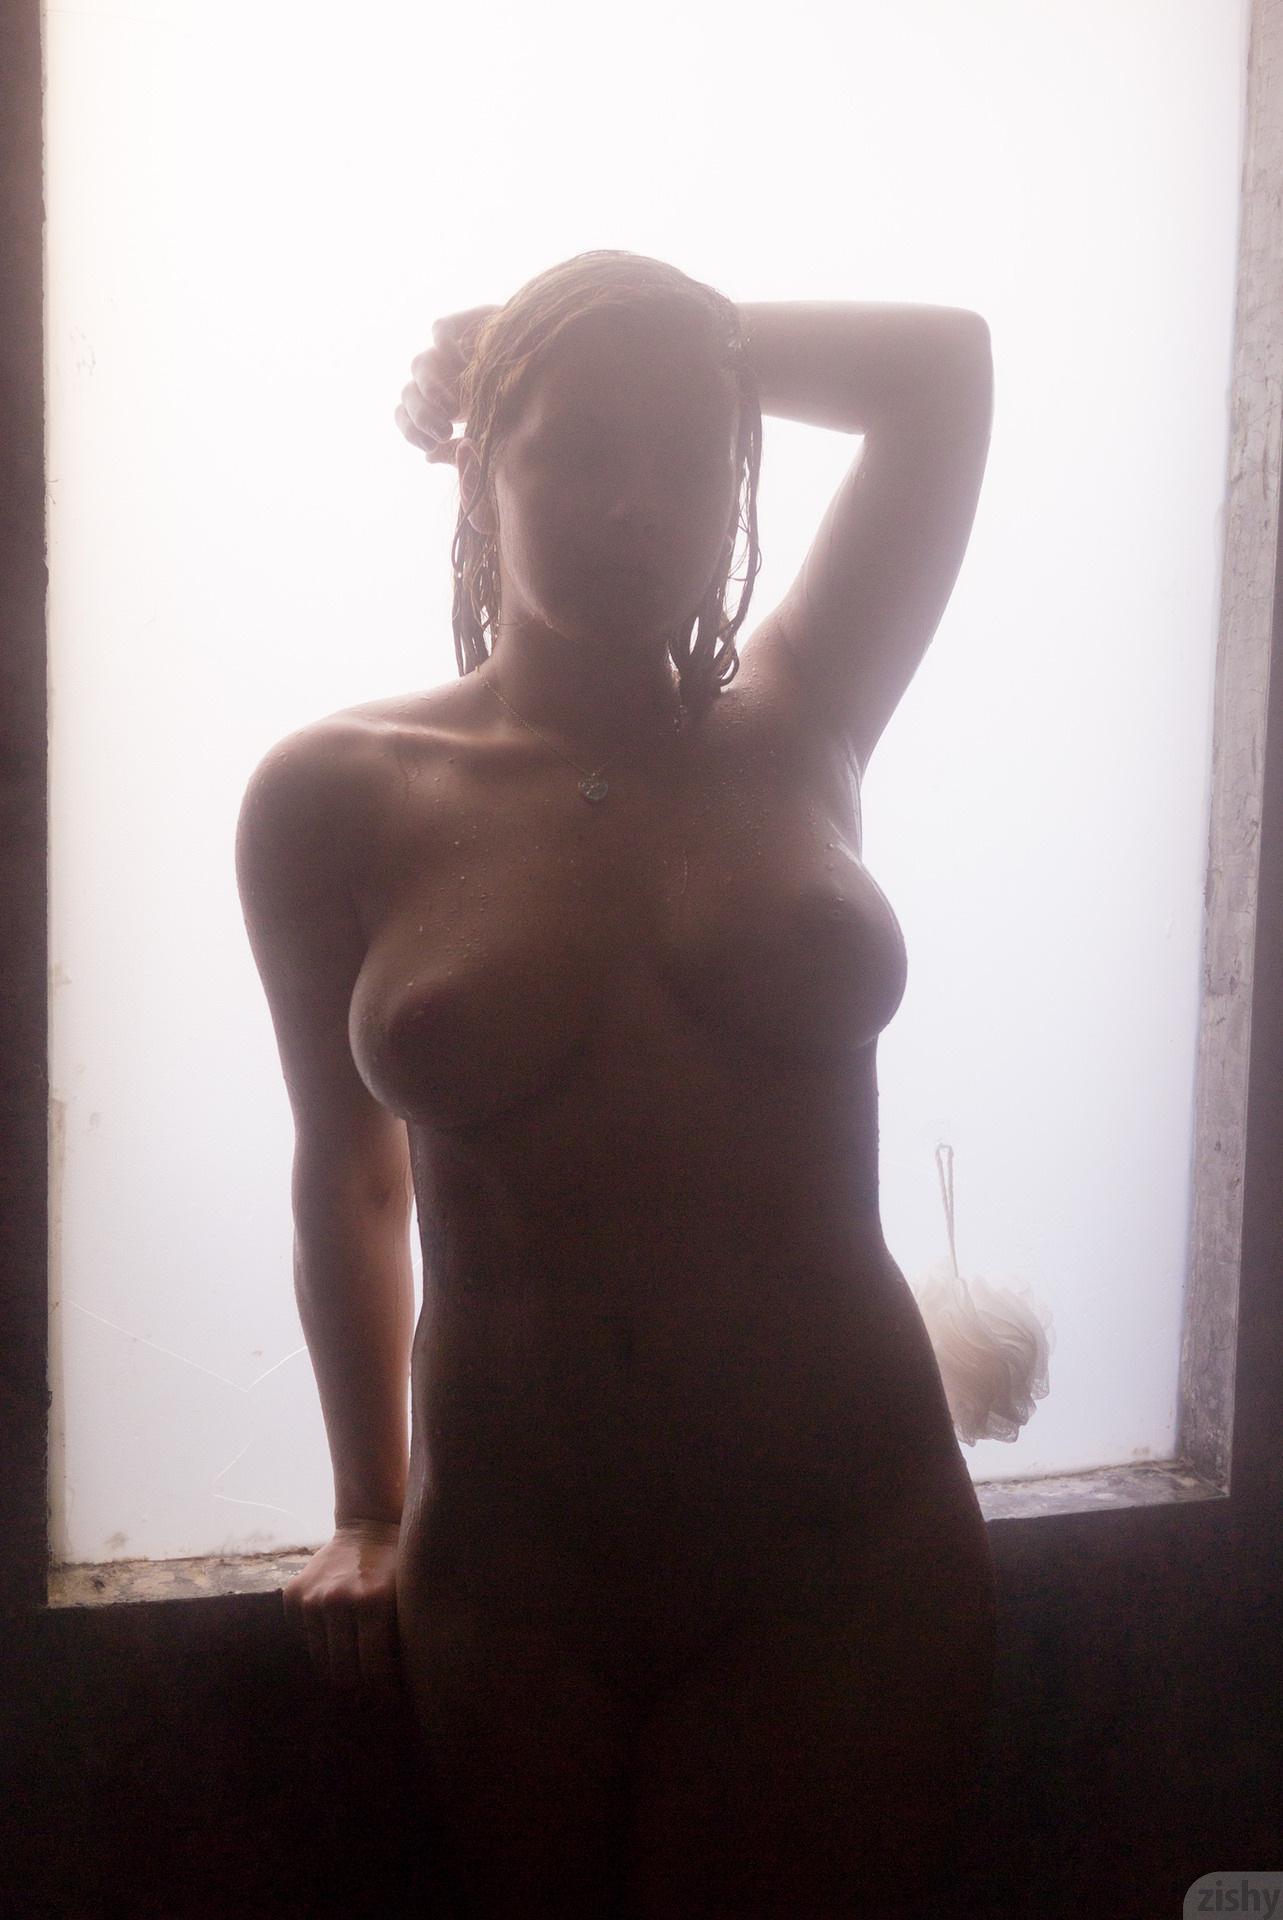 Keisha Grey Drop The Soap Zishy (32)